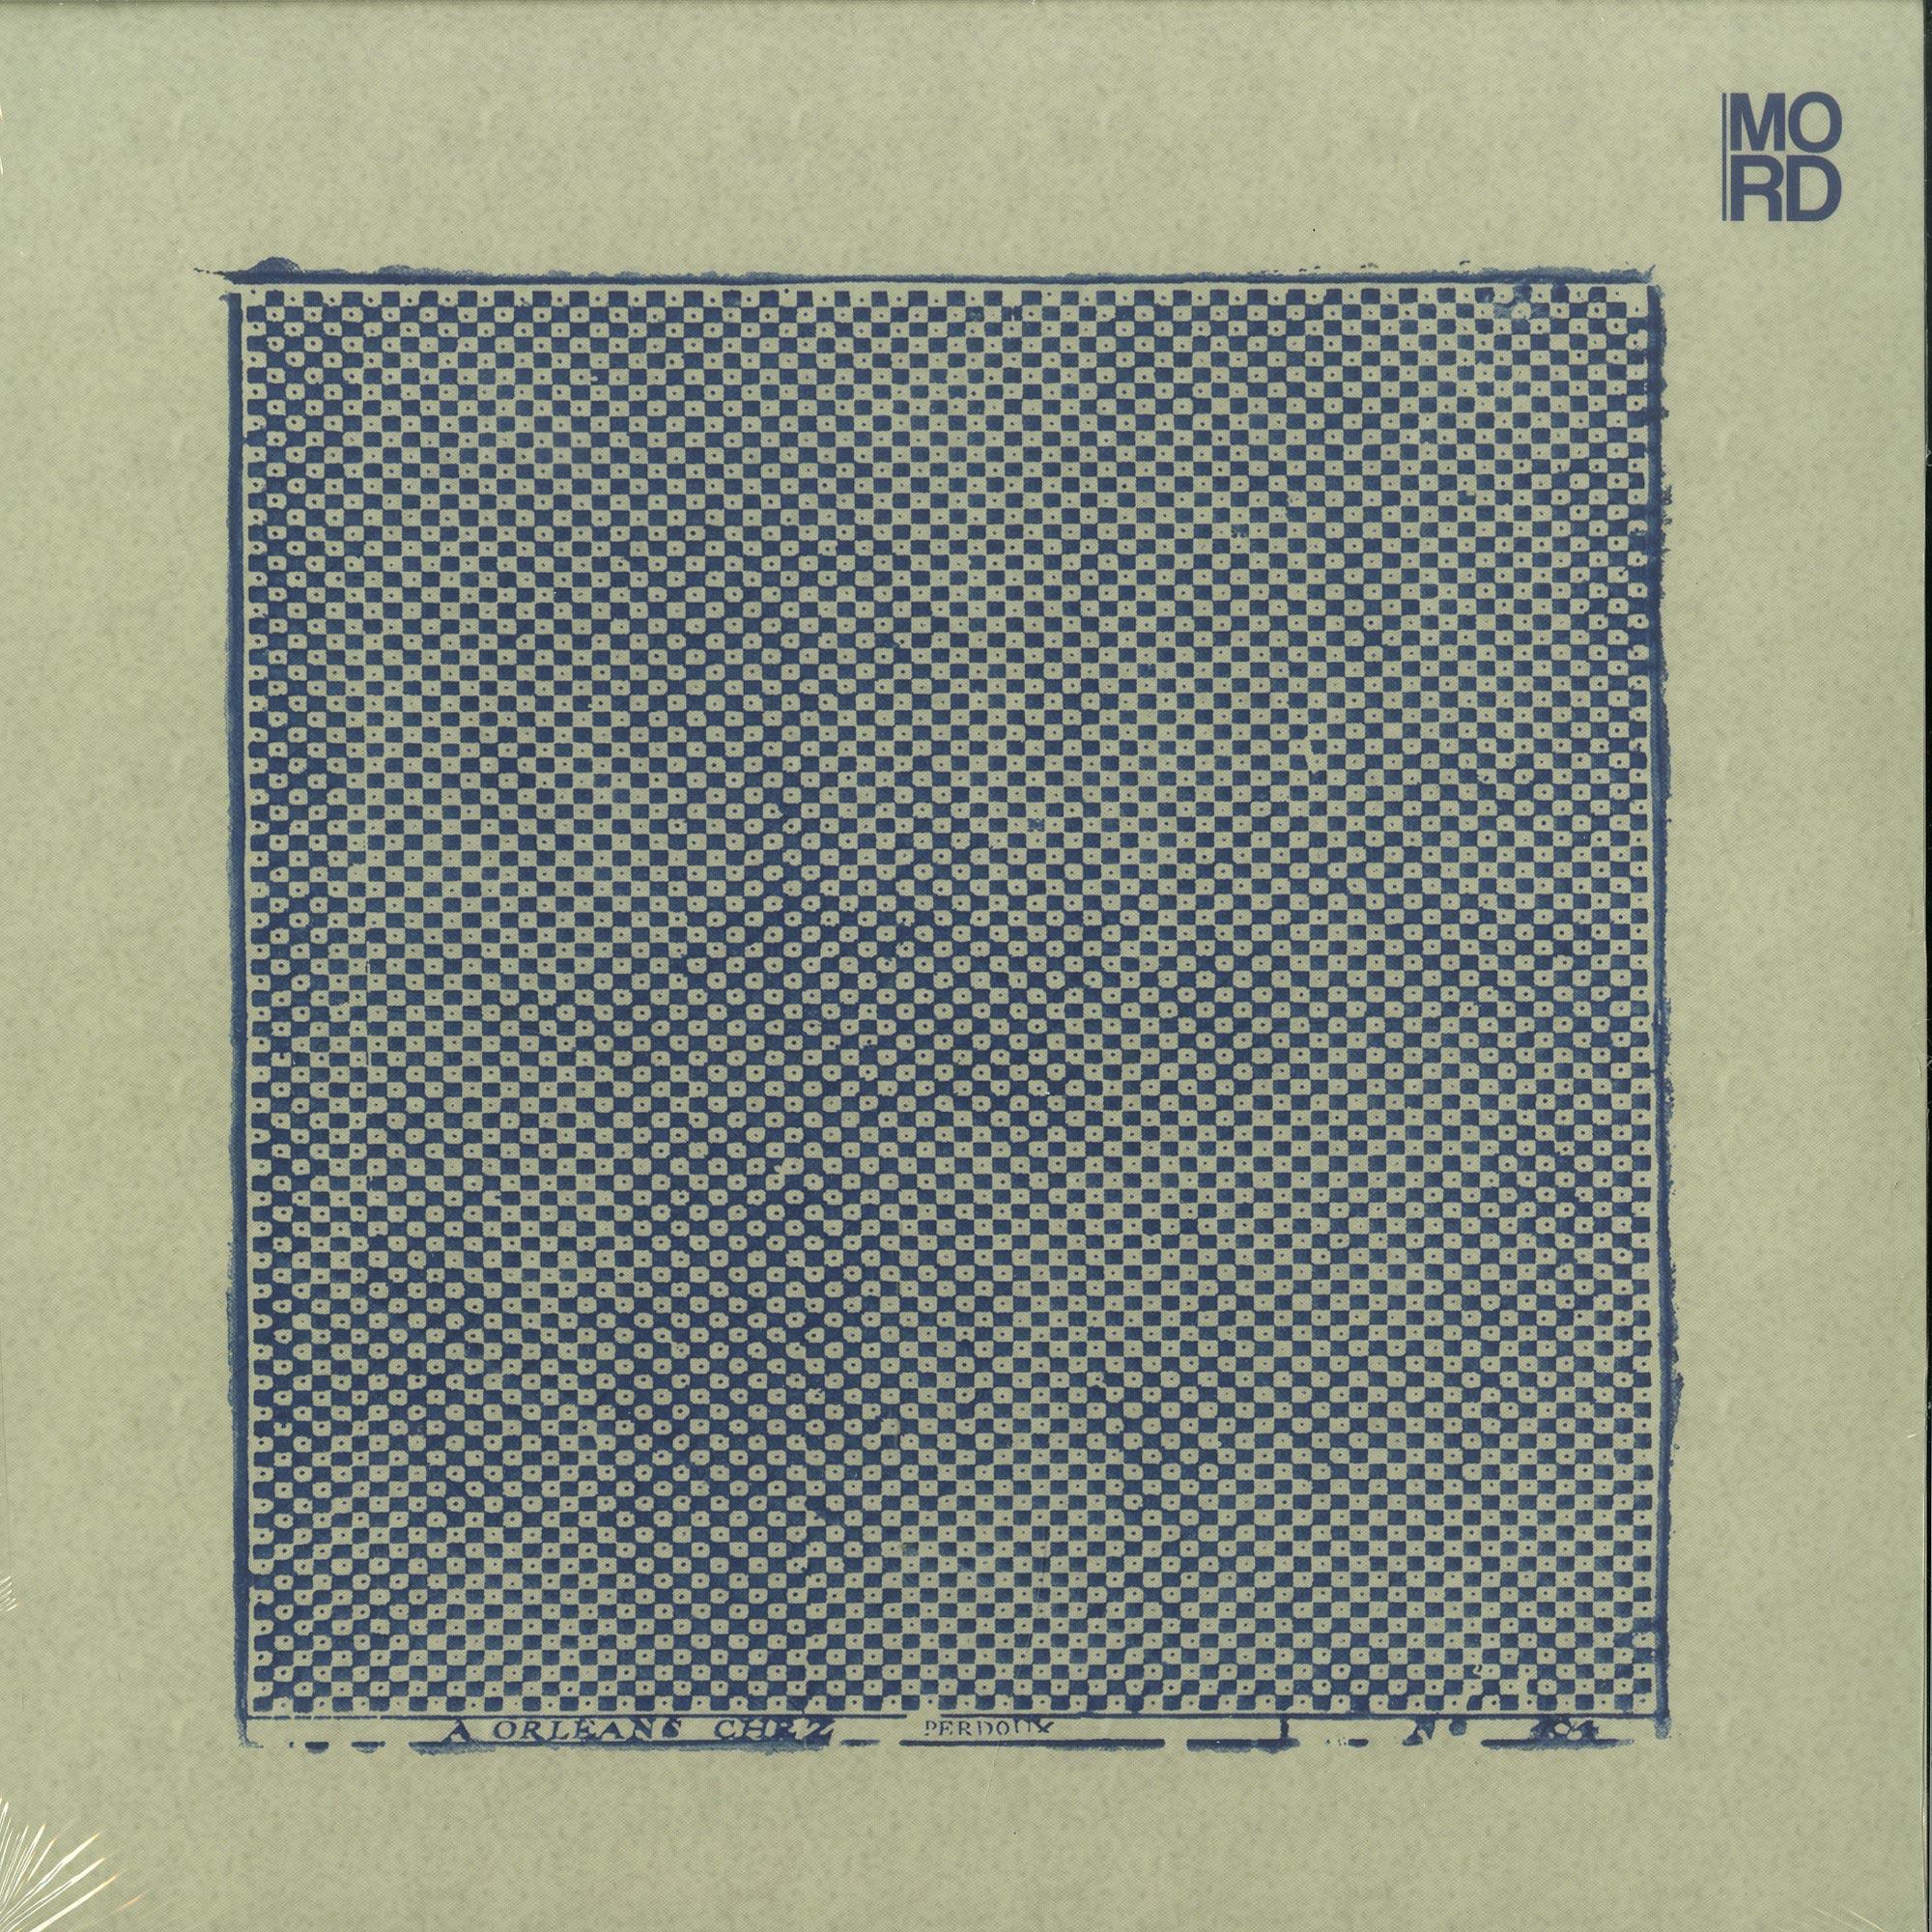 Endlec - ROTTEN NATION EP